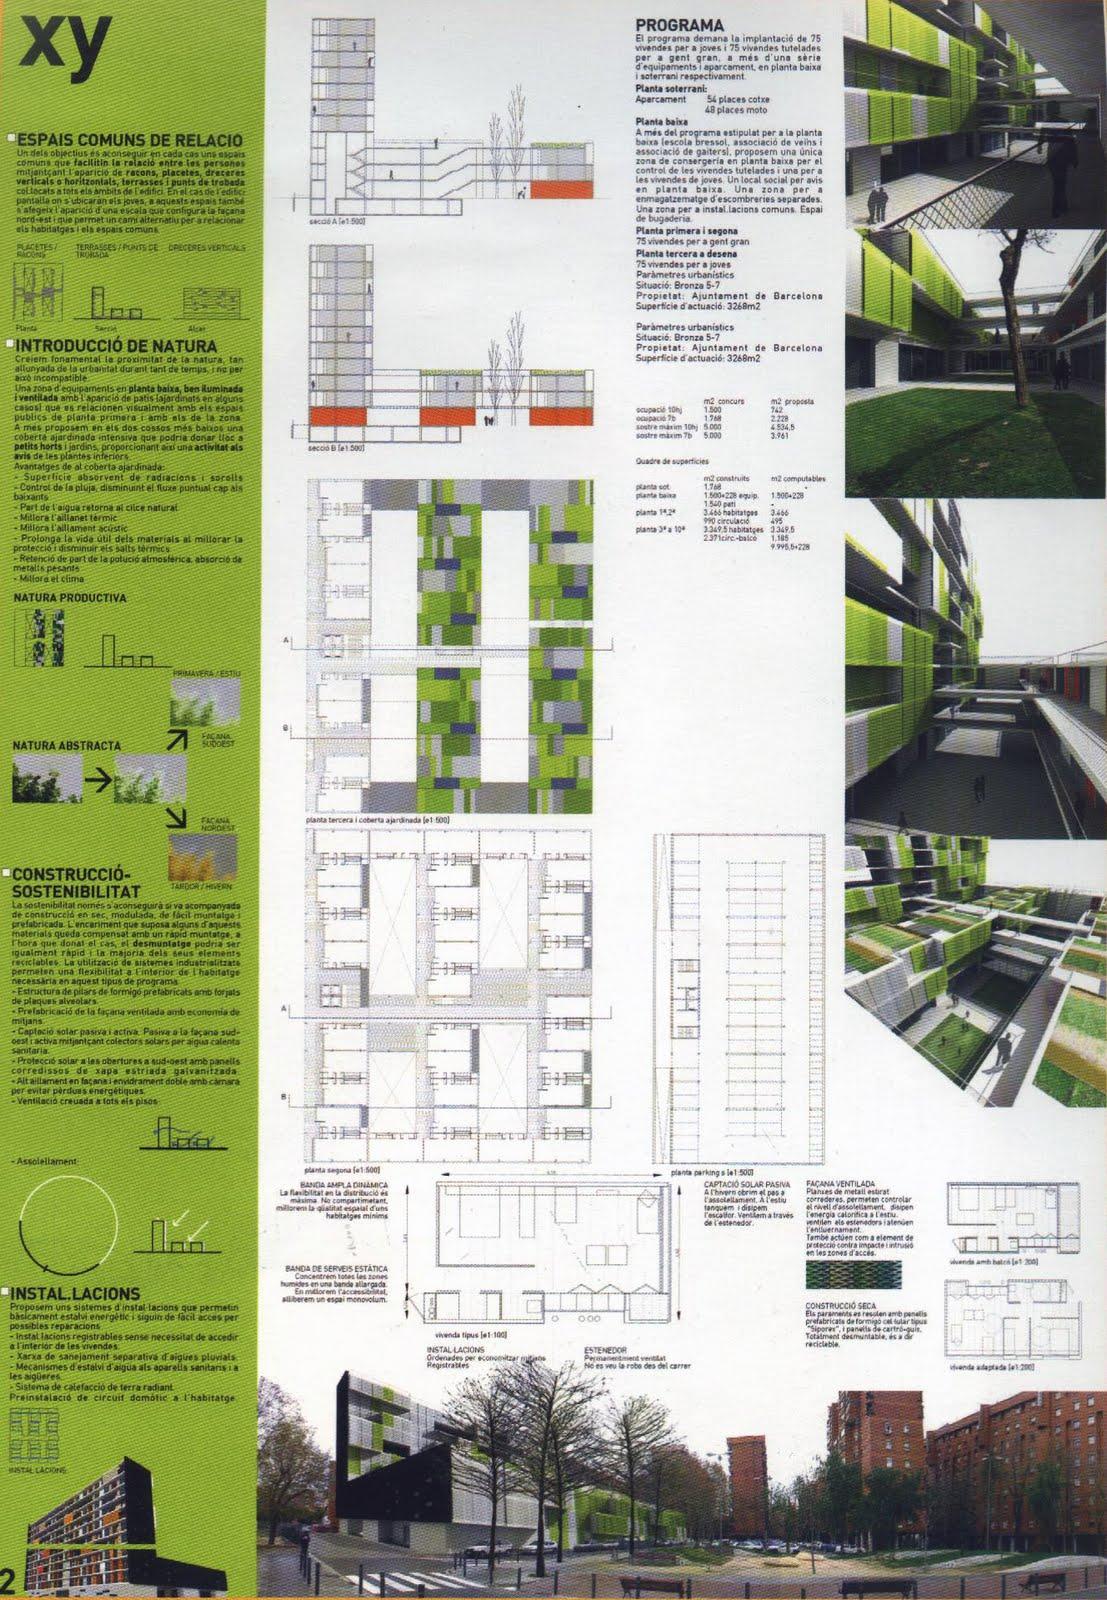 Tia dos c tedra ab modelos de lamina for Laminas arquitectura